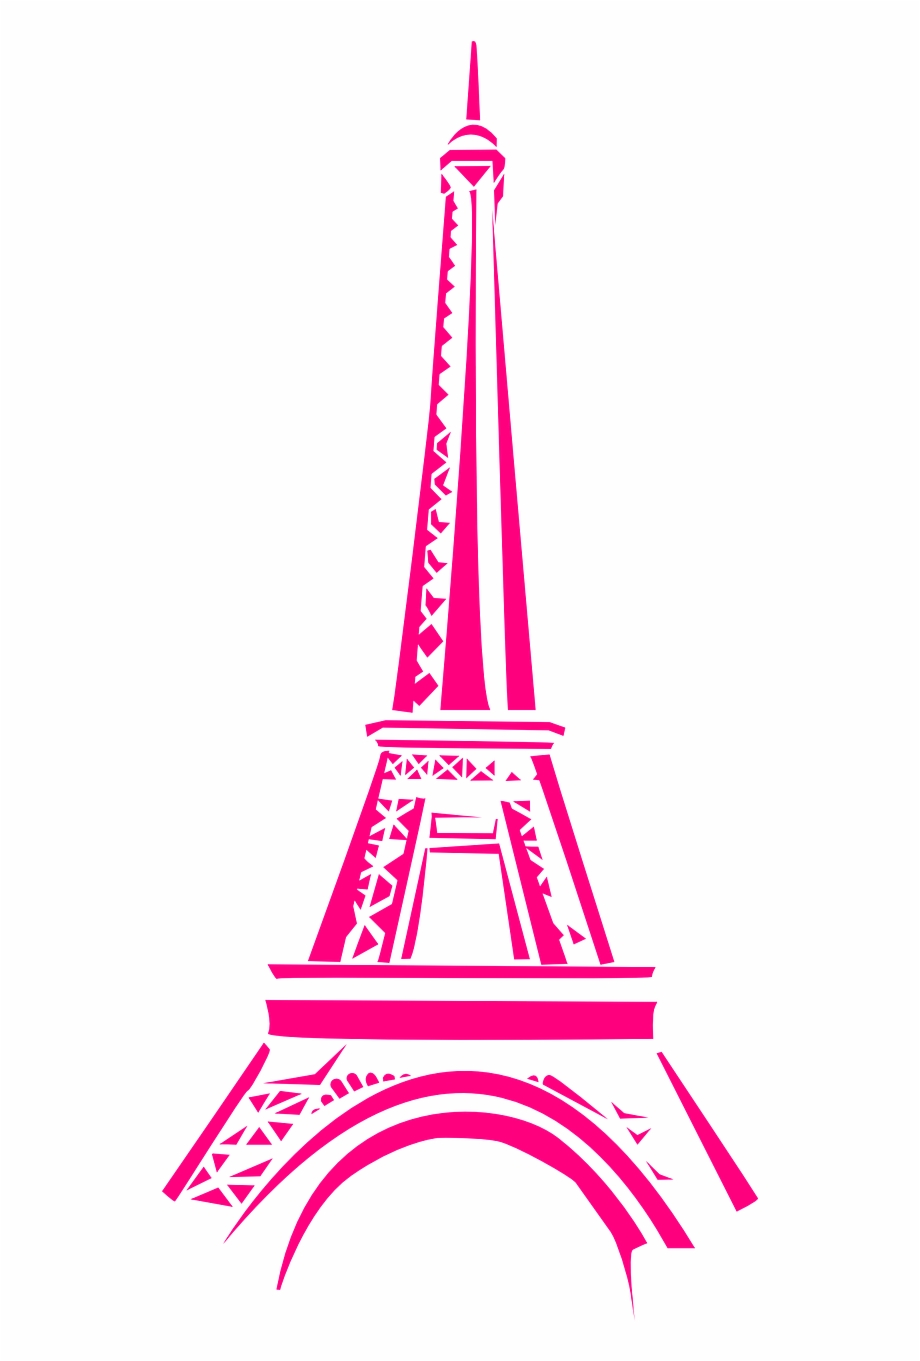 France, Eiffel Tower France Landmark Paris Tower E - Eiffel Tower Clipart,  HD Png Download - 944x1280(#59118) - PngFind